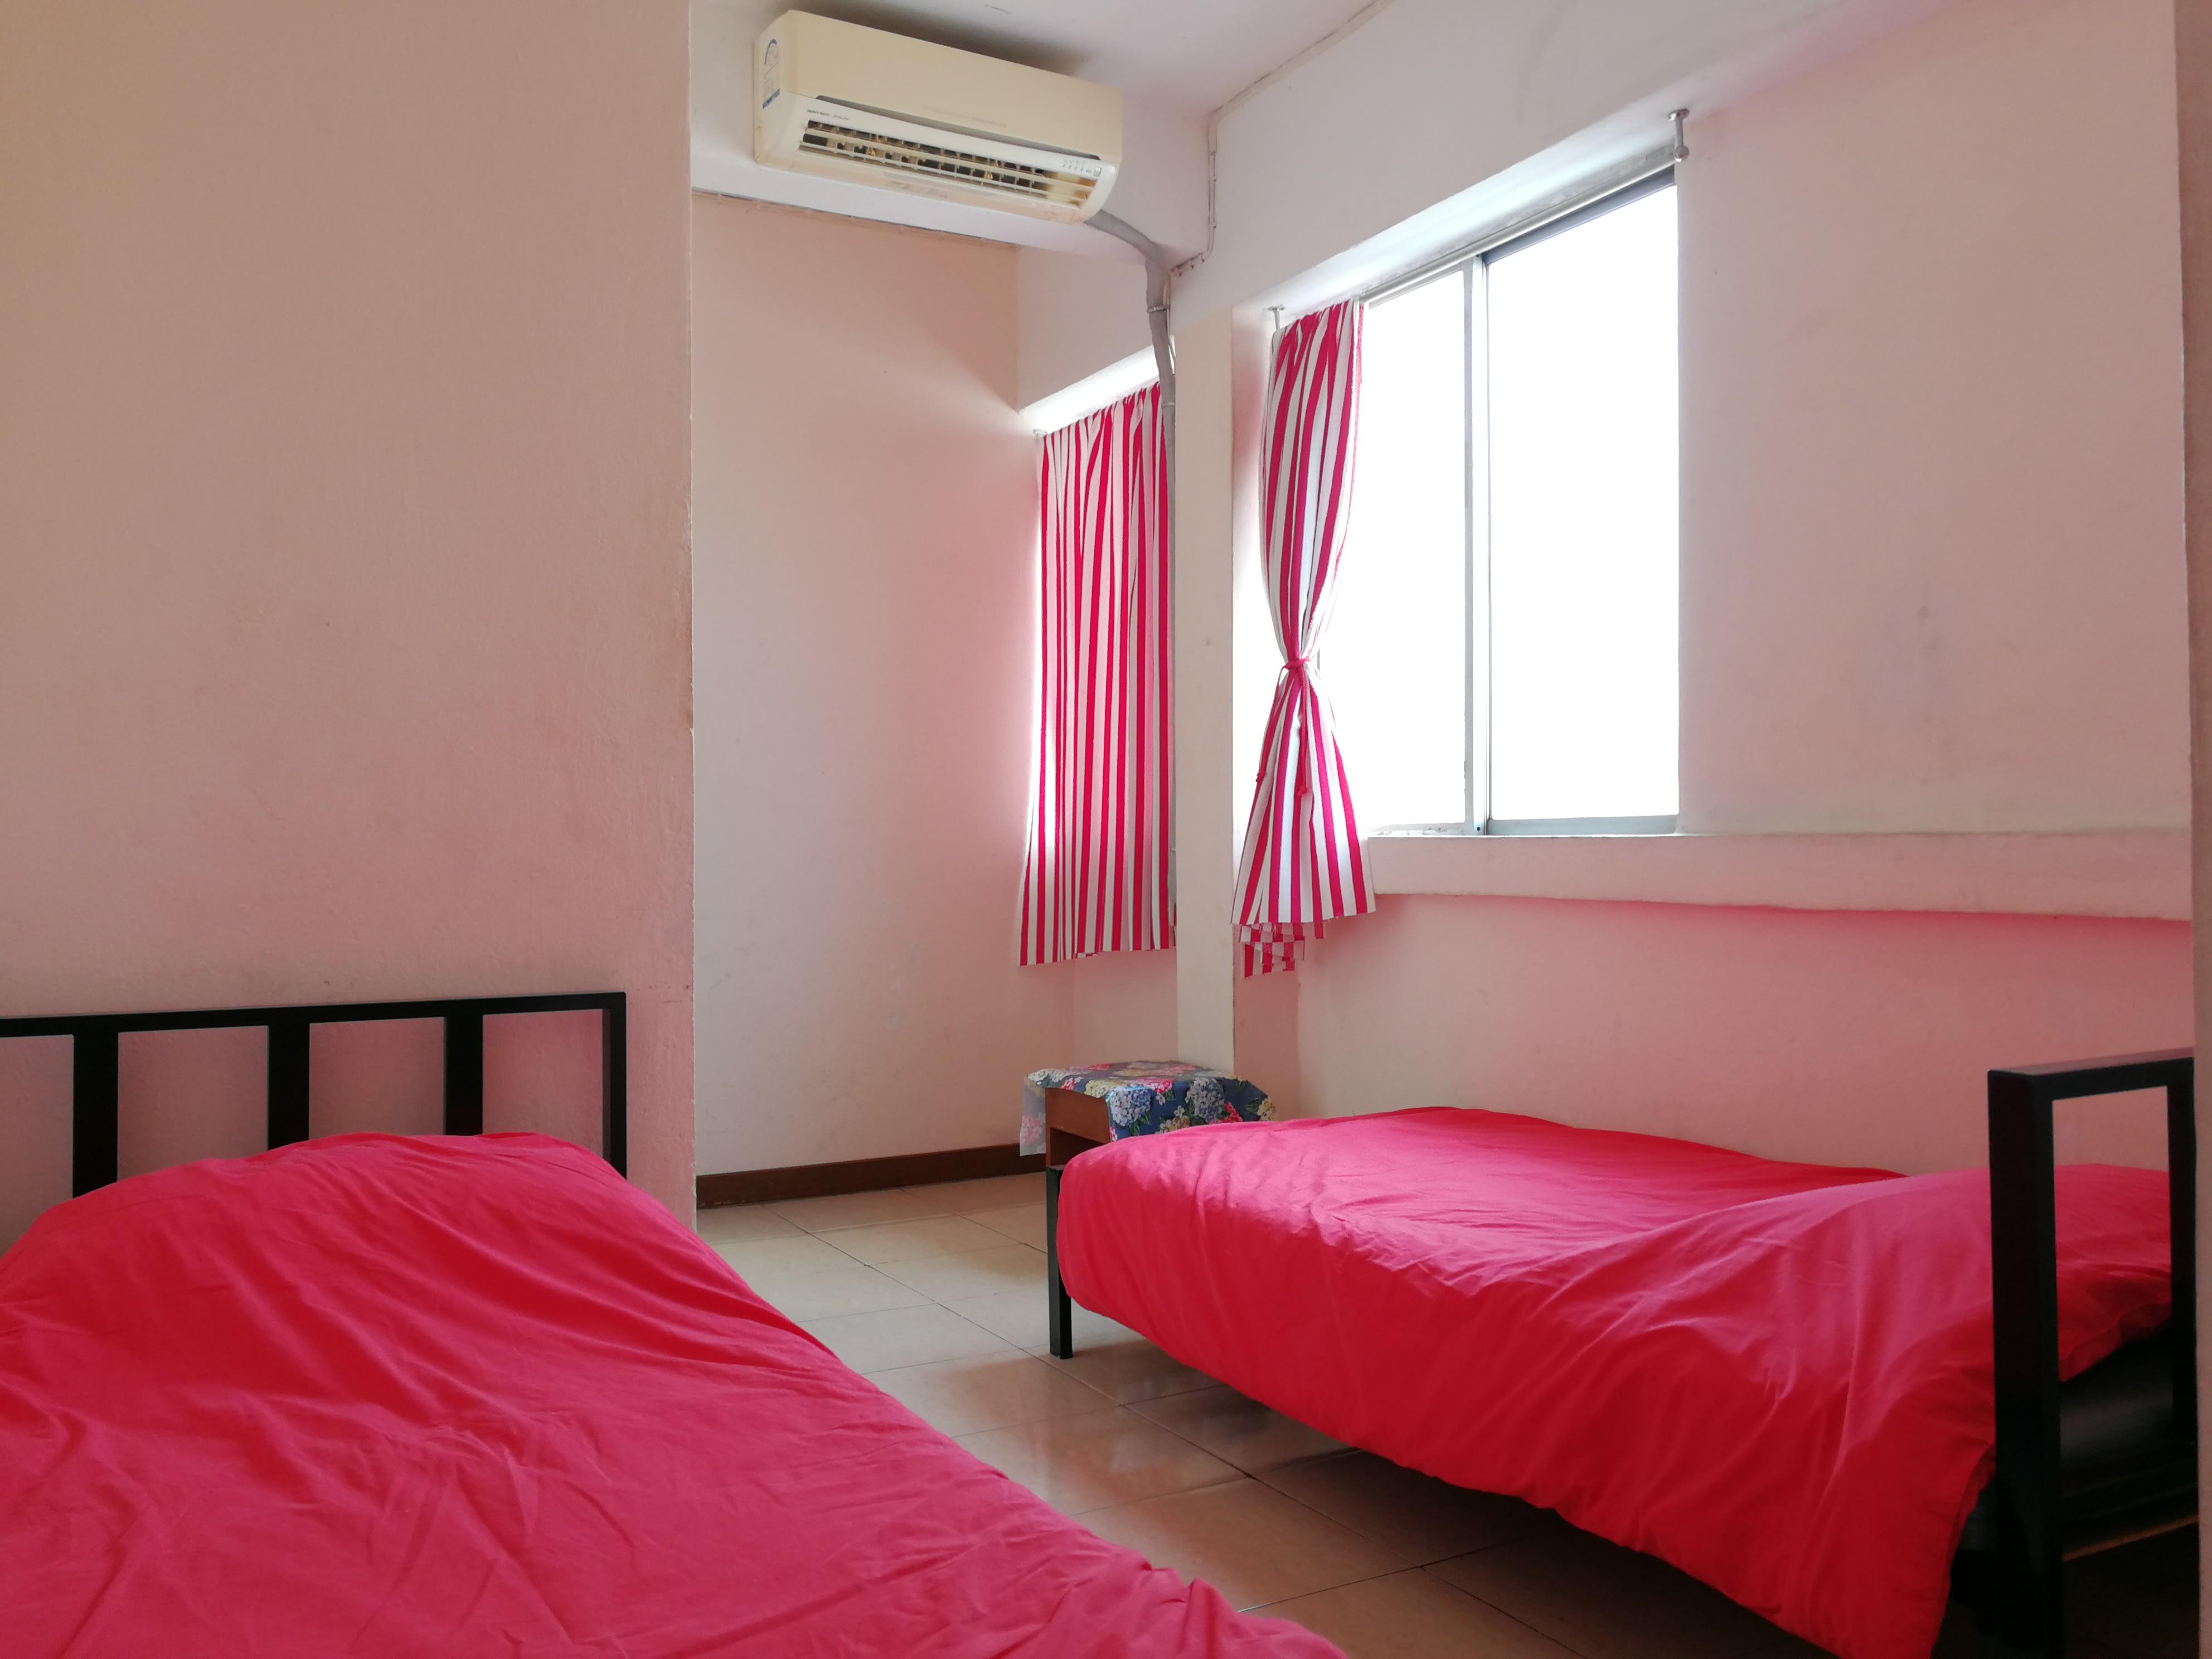 HOSTEL - U-Baan Guesthouse